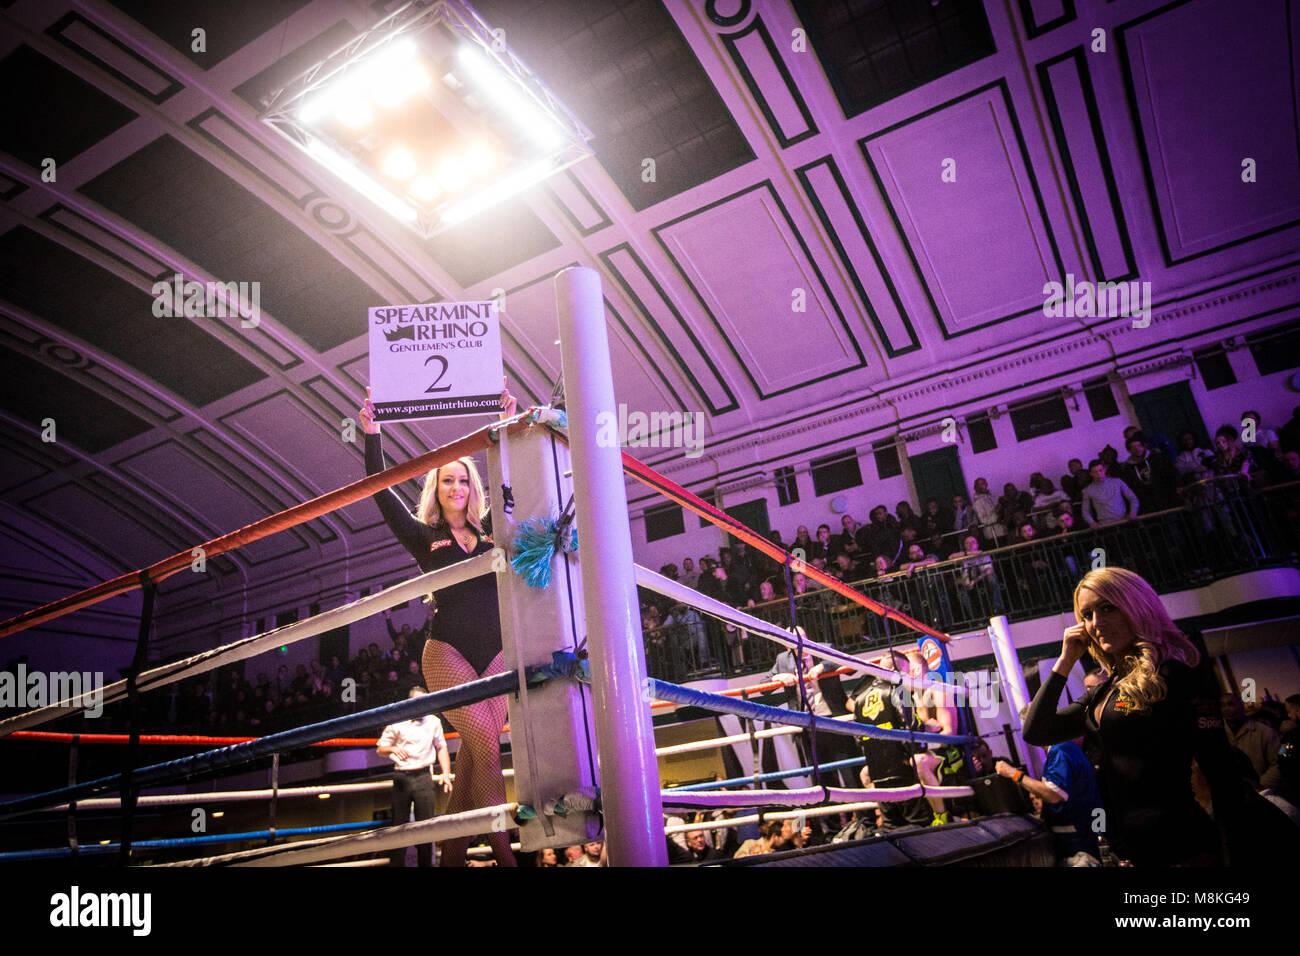 Ring girl at York Hall, Bethnal Green - Stock Image